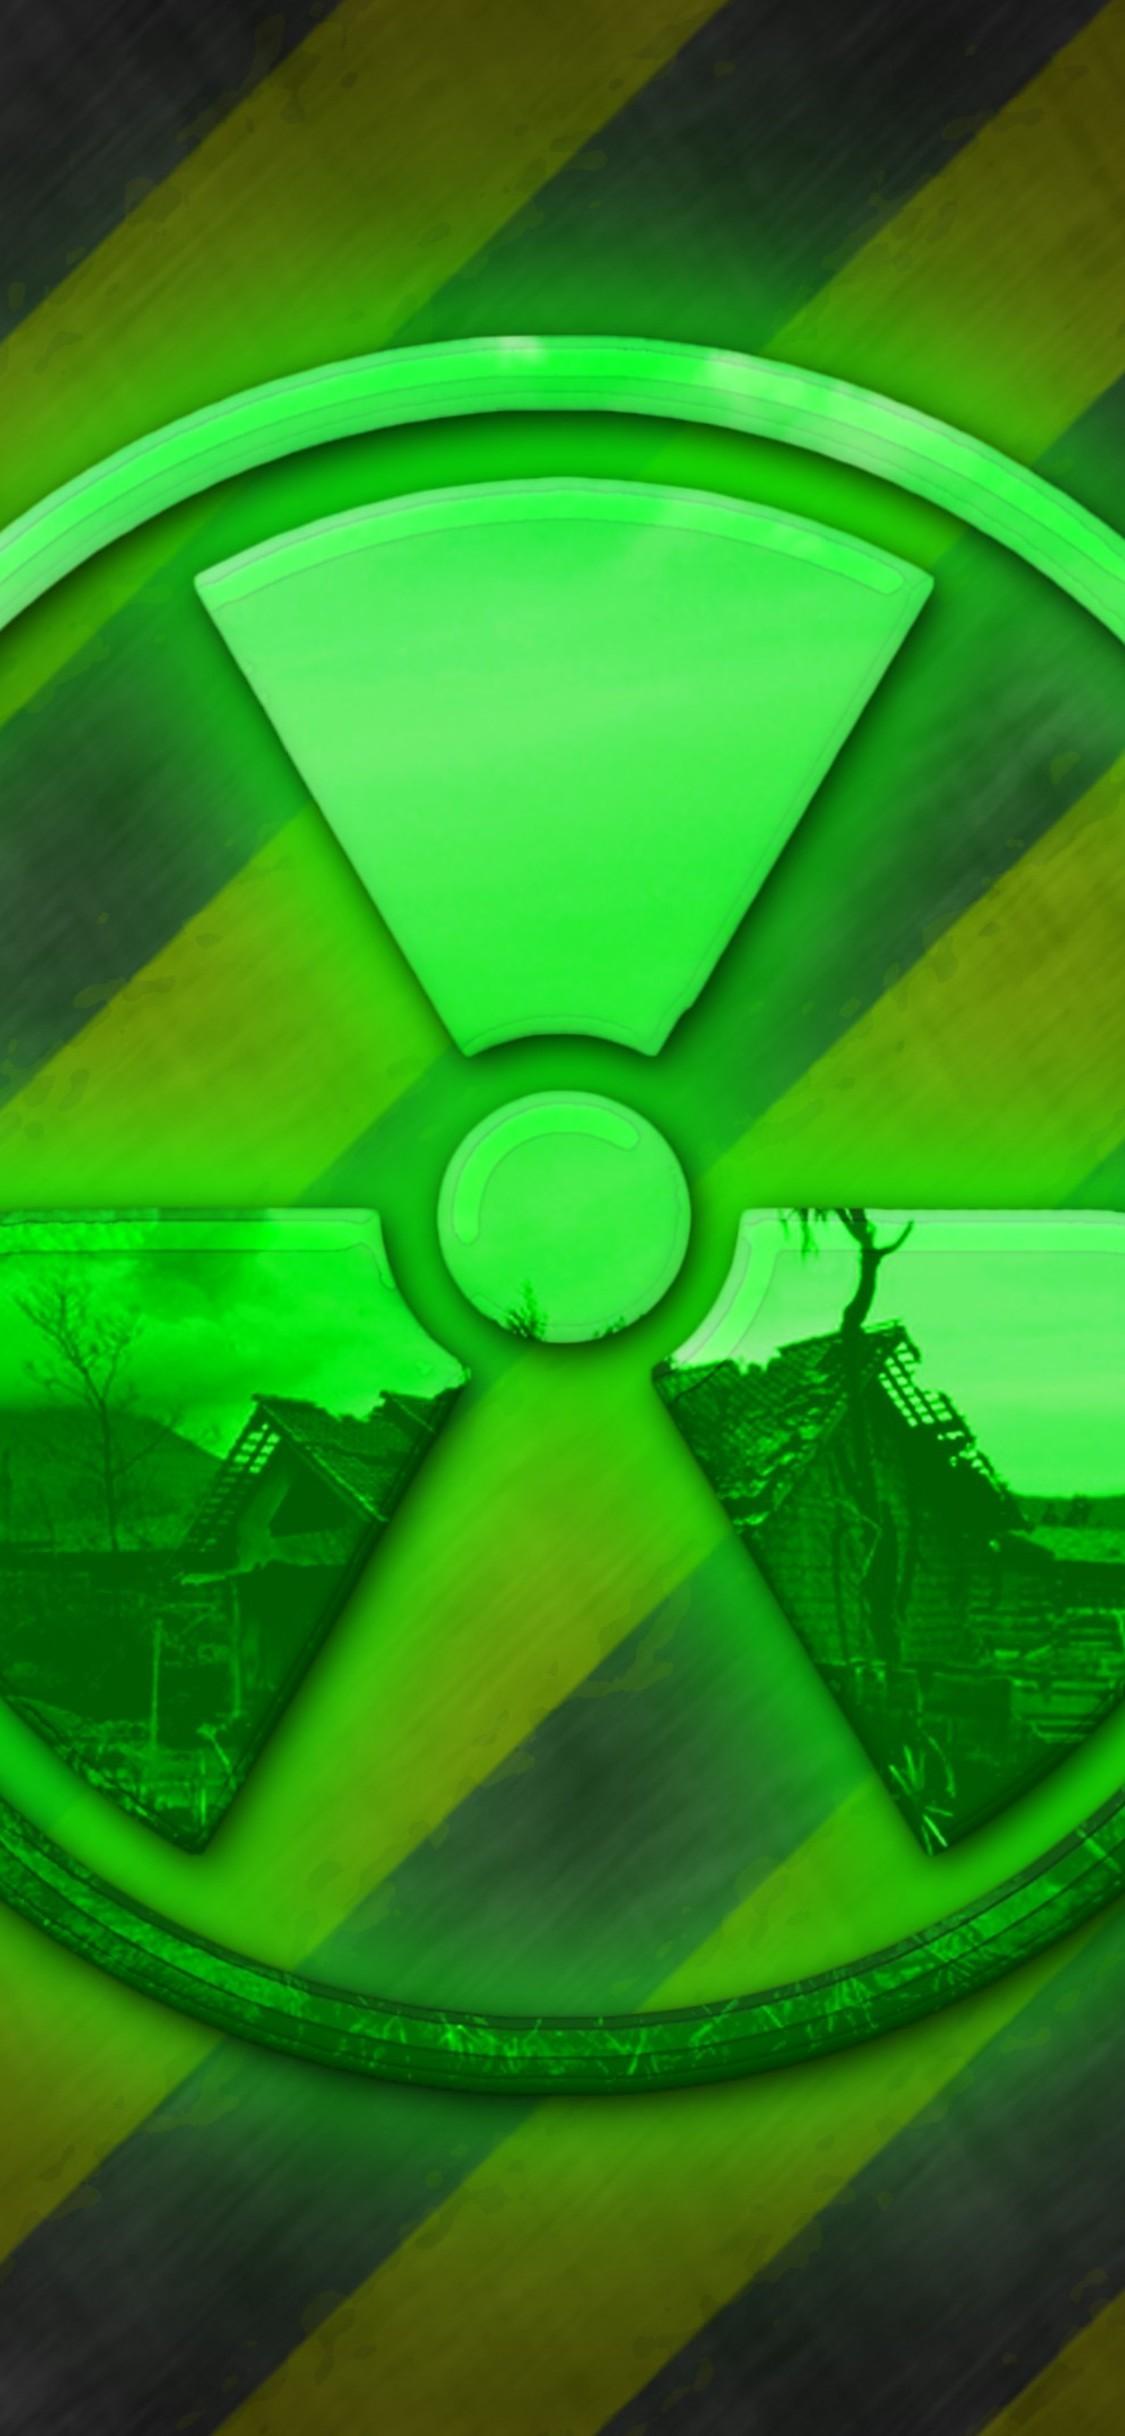 Res: 1125x2436, radioactive-8d.jpg